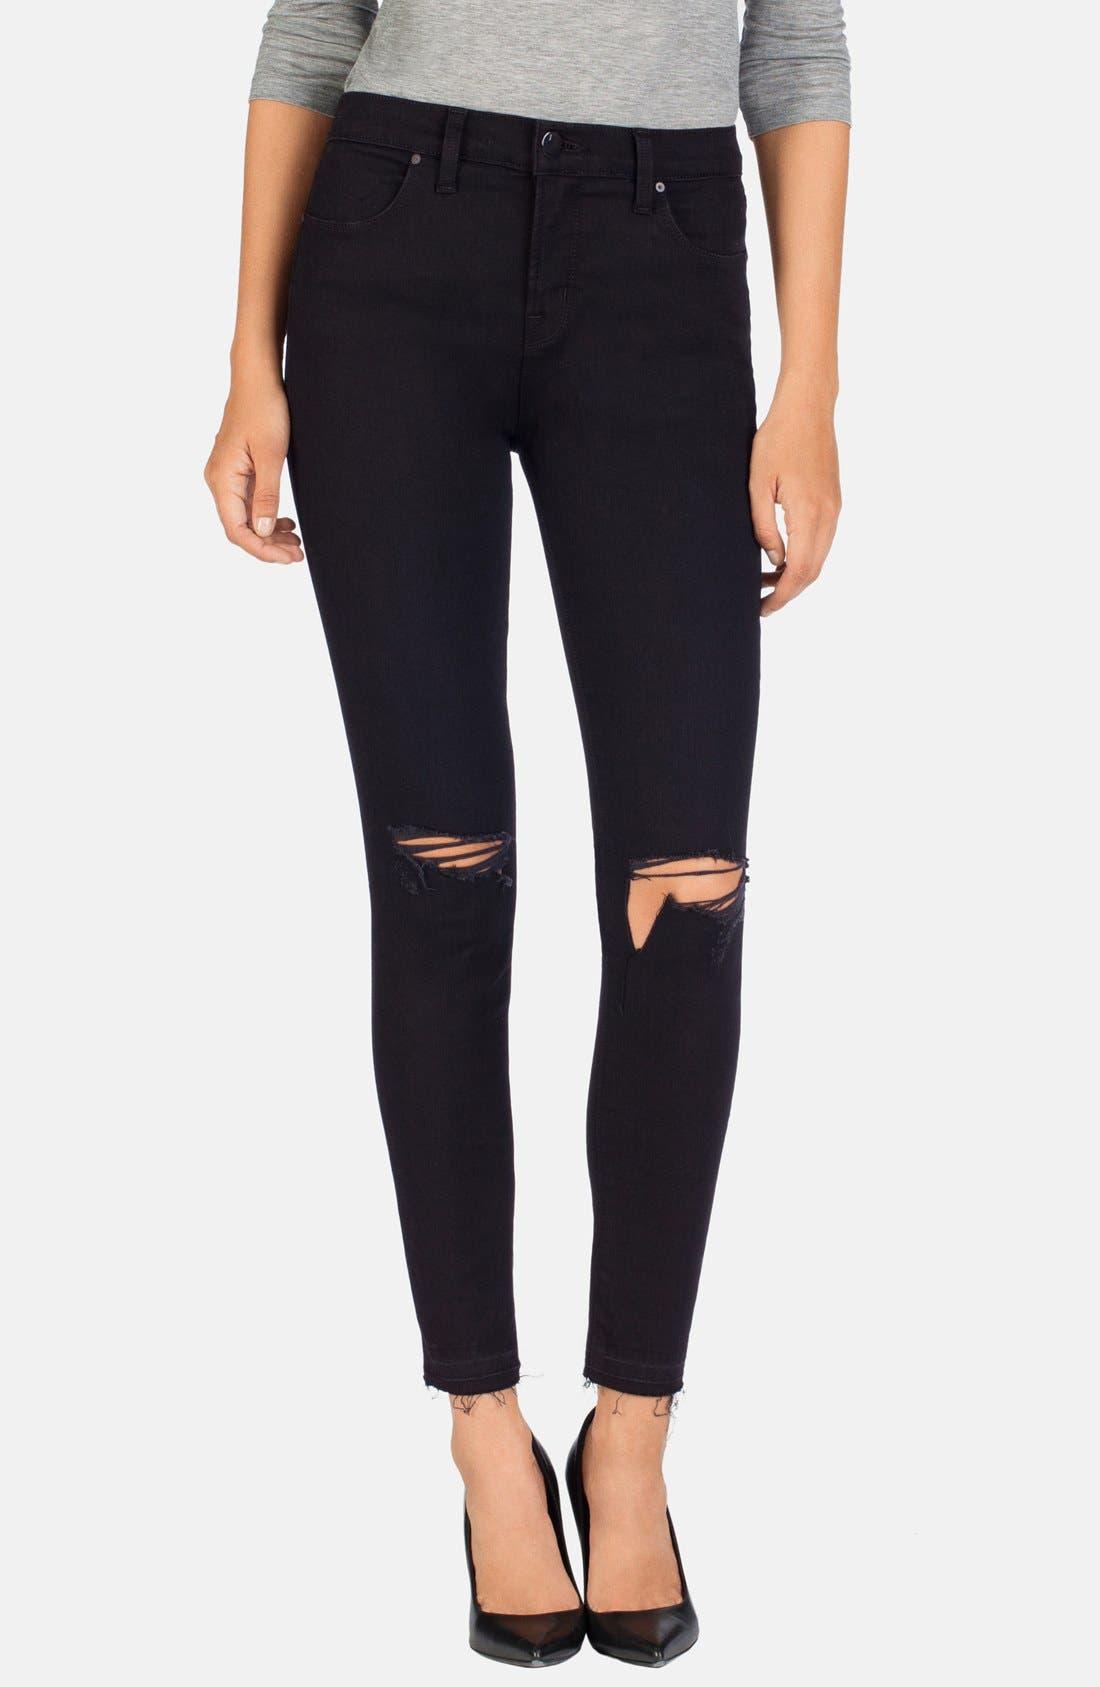 Main Image - J Brand 'Alana' High Rise Crop Jeans (Offbeat)